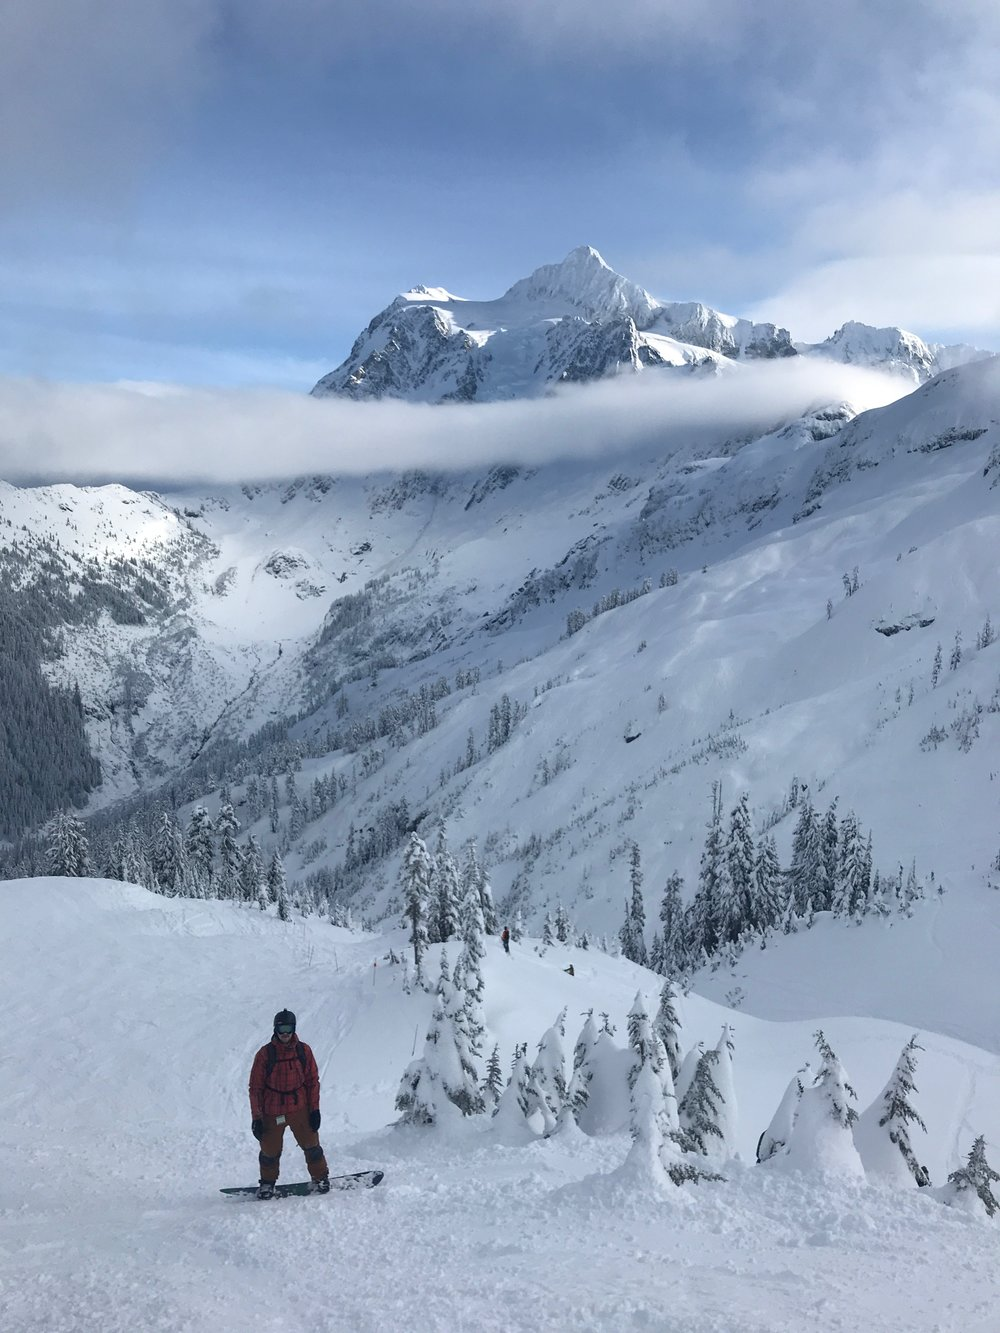 Mt Baker Ski Area